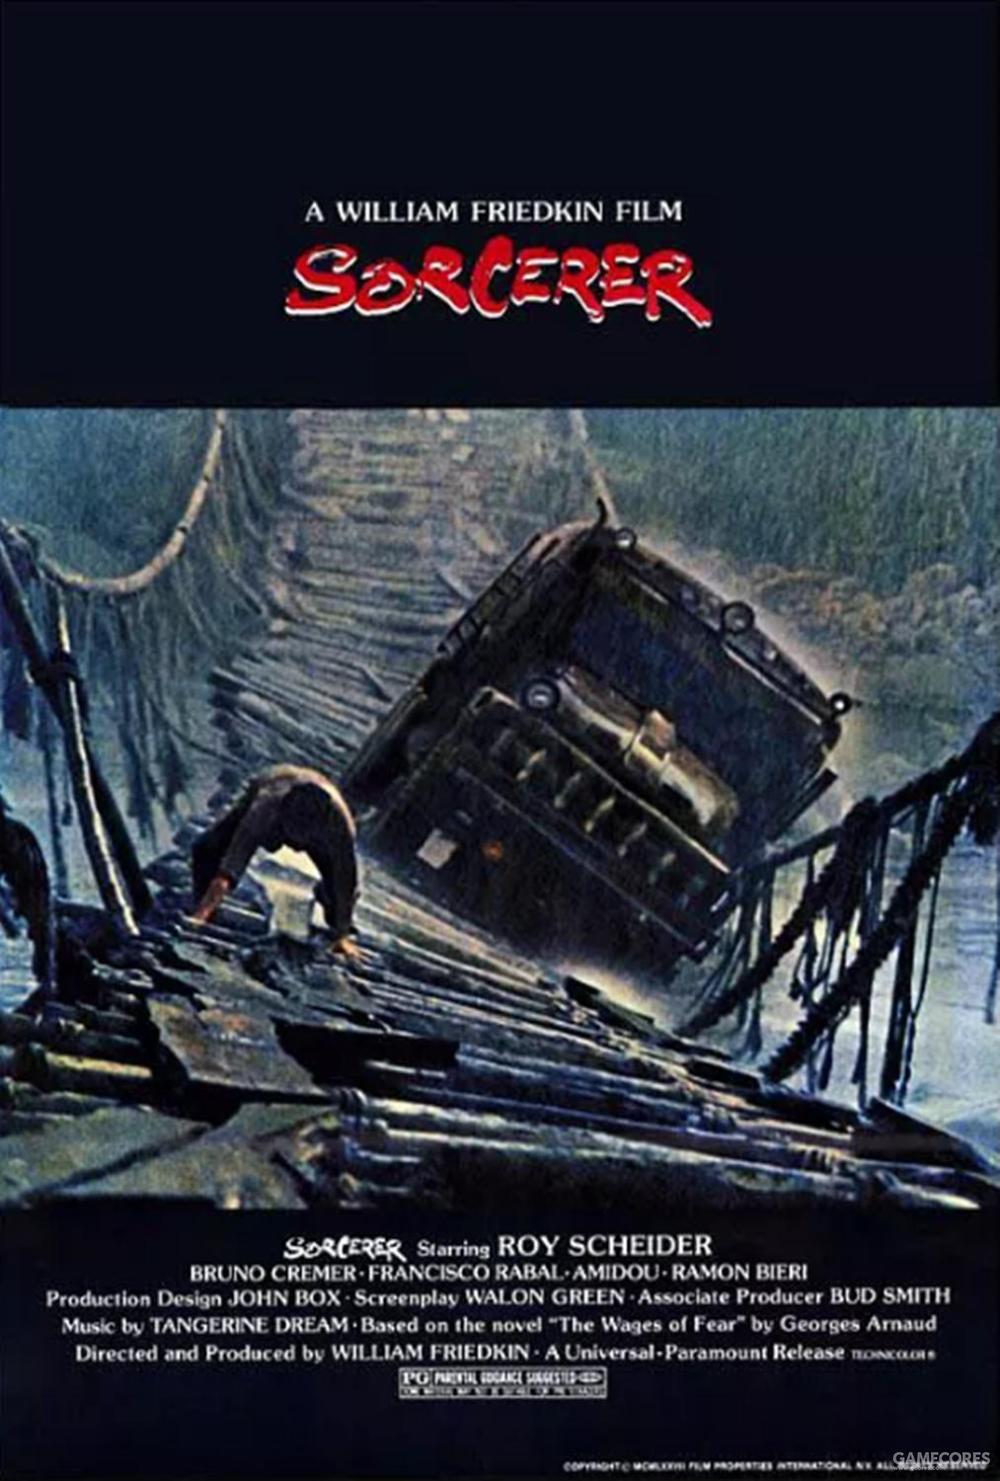 3.《千惊万险》(Sorcerer)(1977)